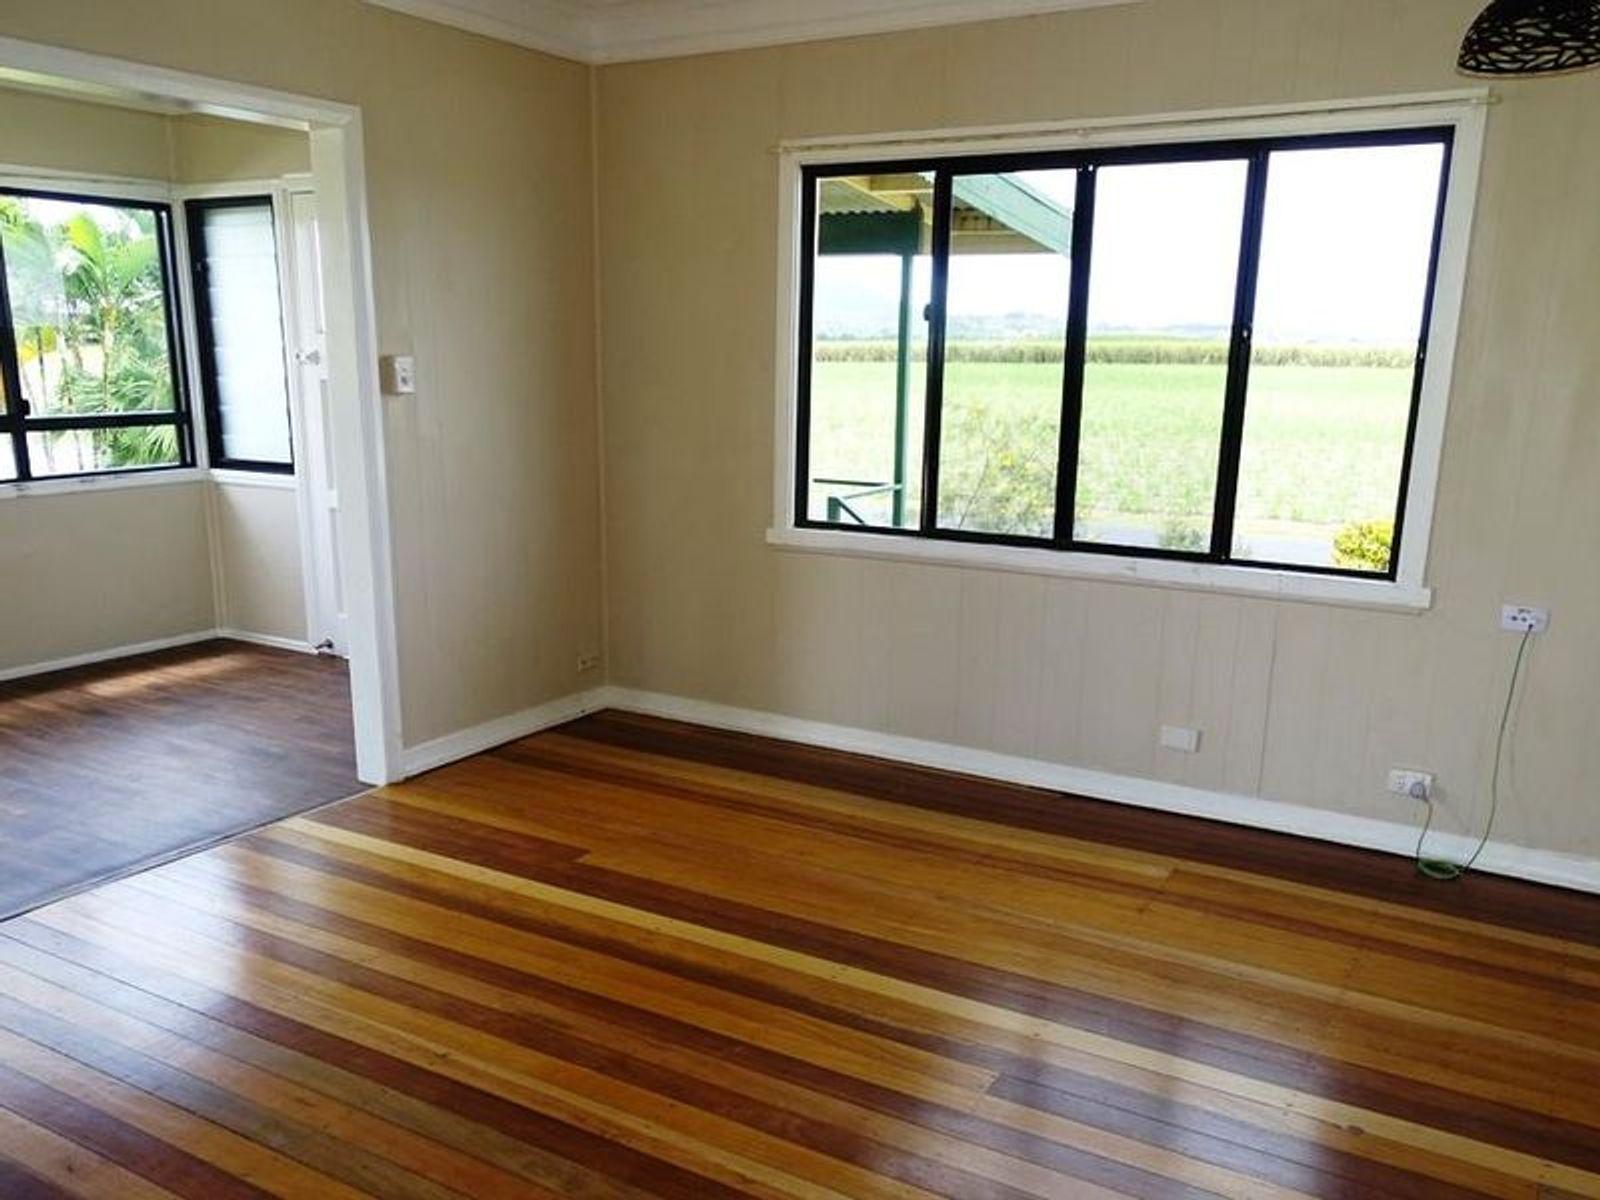 149 SUNDOWN Road, Innisfail, QLD 4860